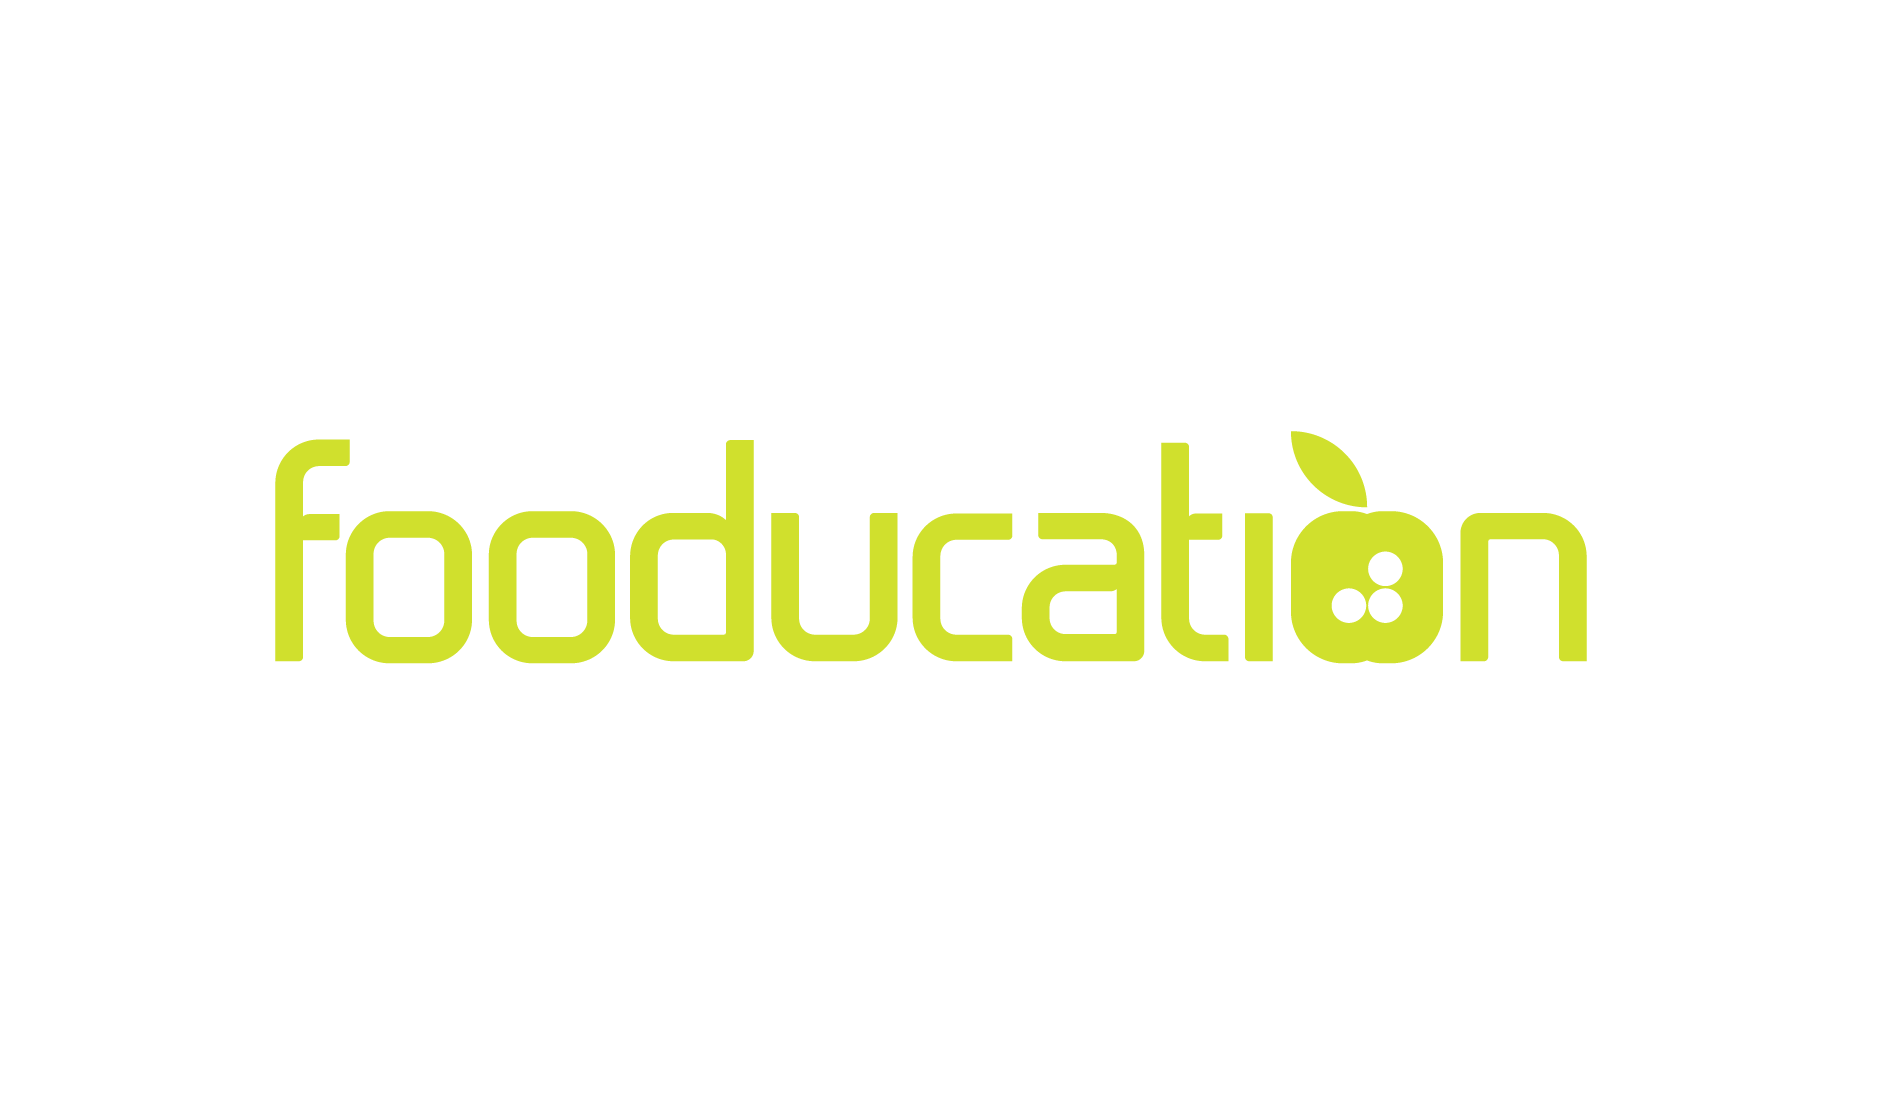 fooducation logo design solo-Logodesign fooducation